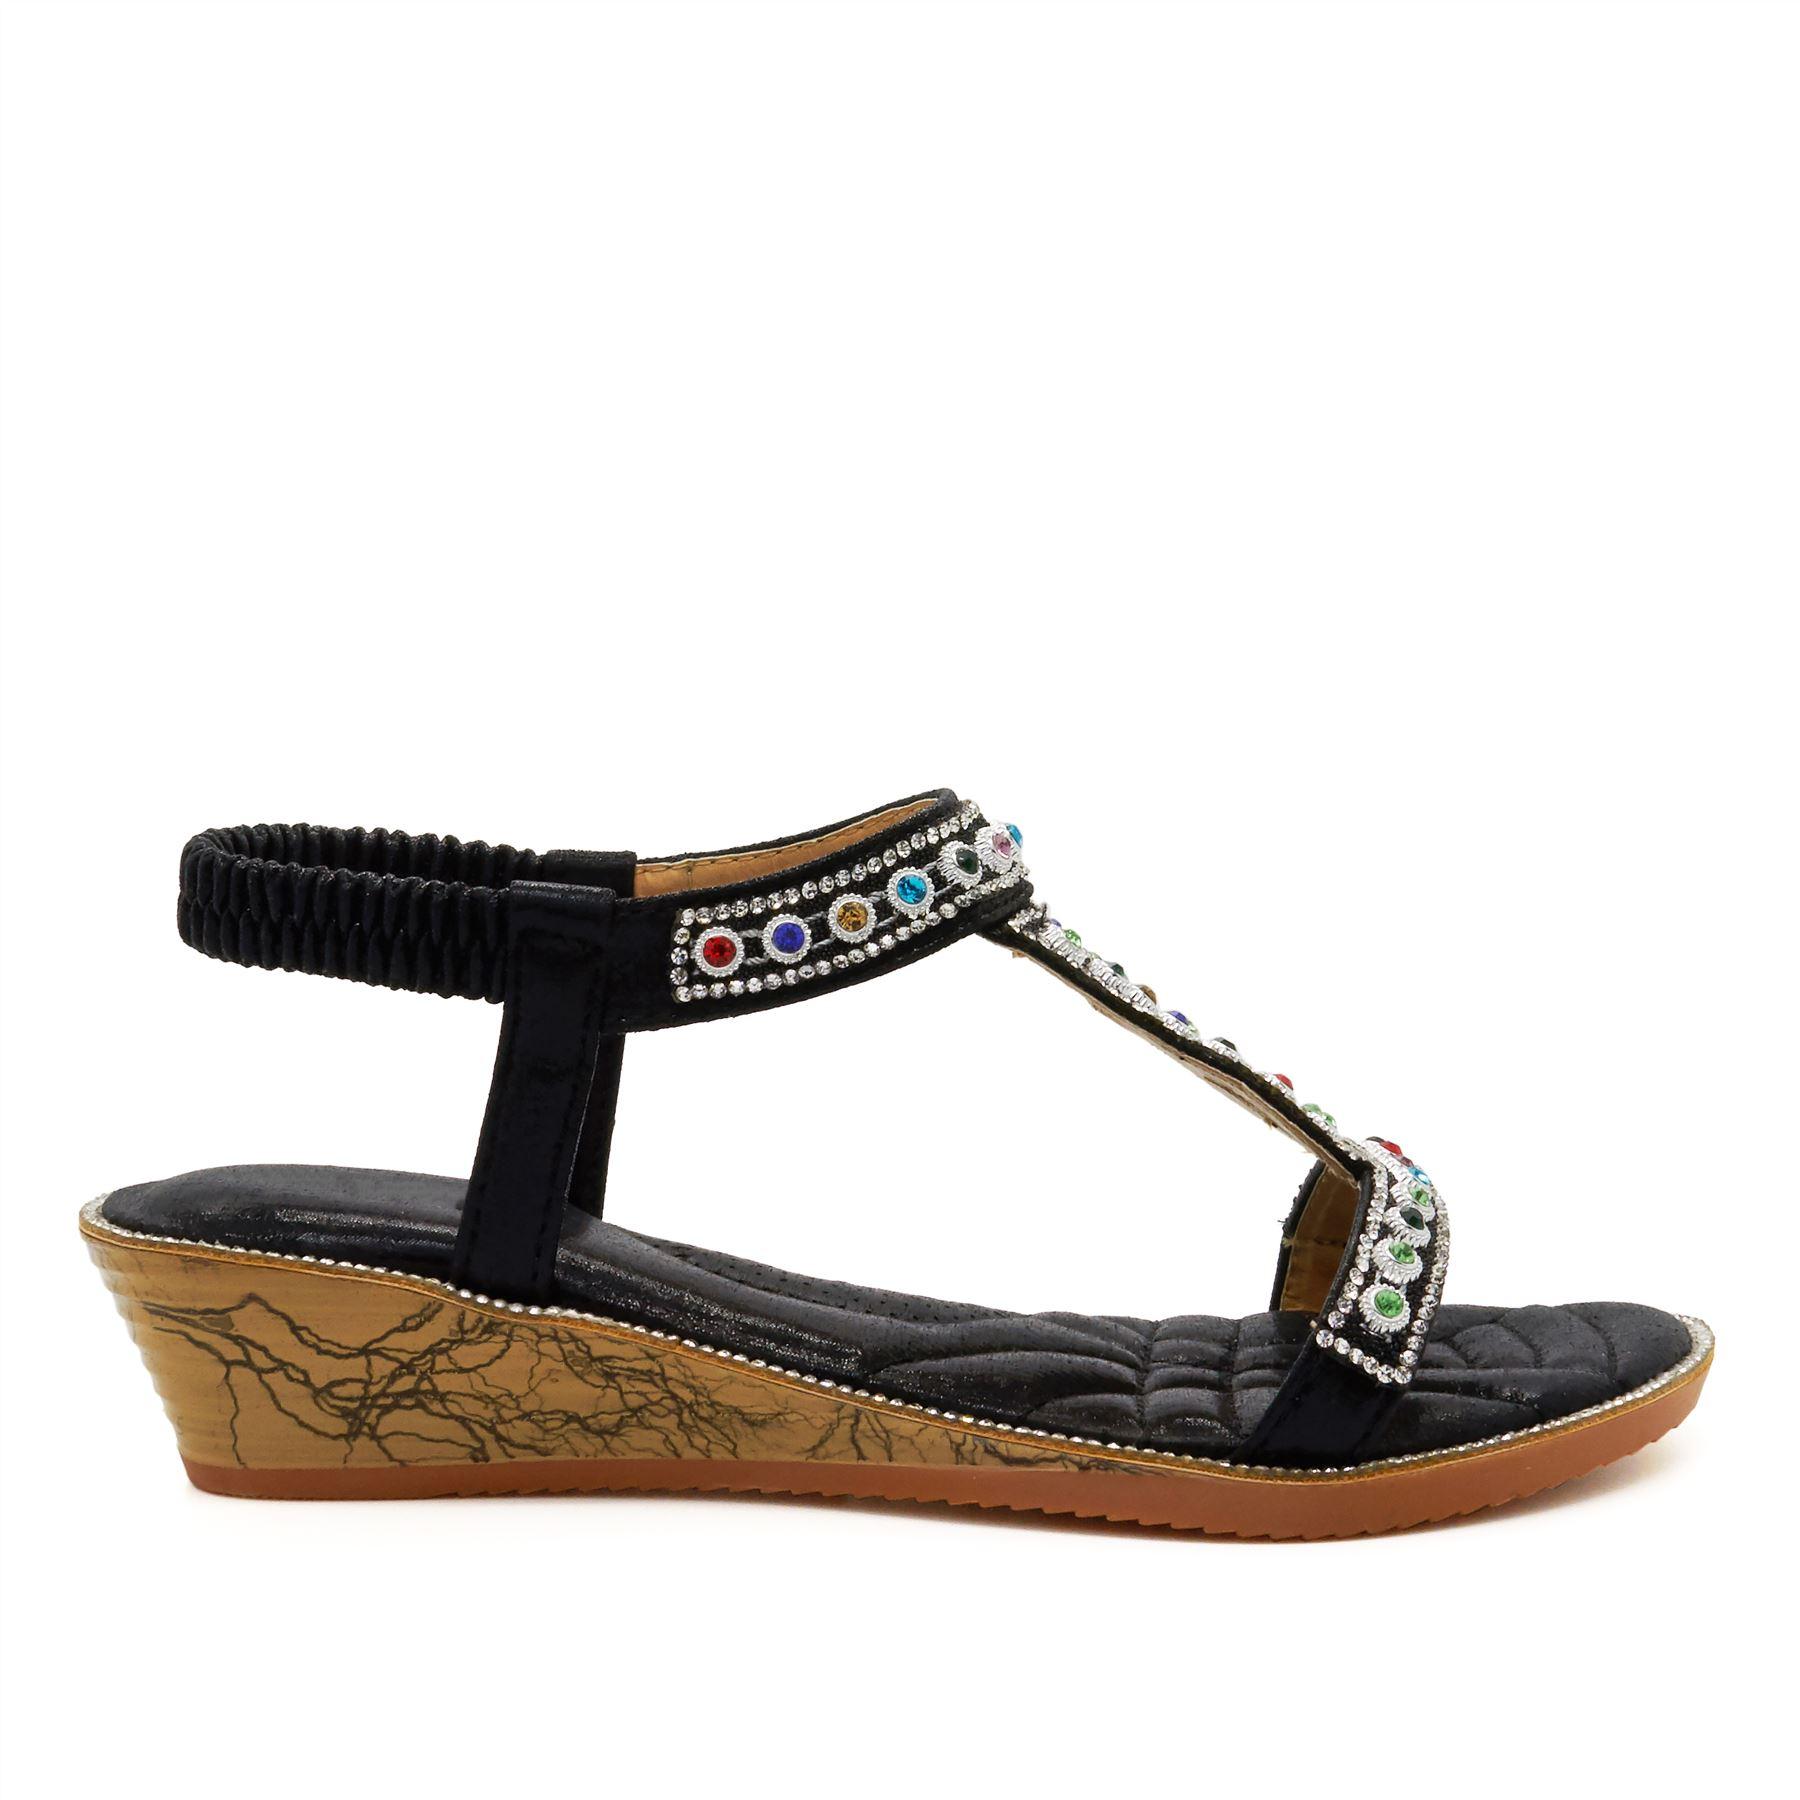 Amazon Shoes Womens Sandals